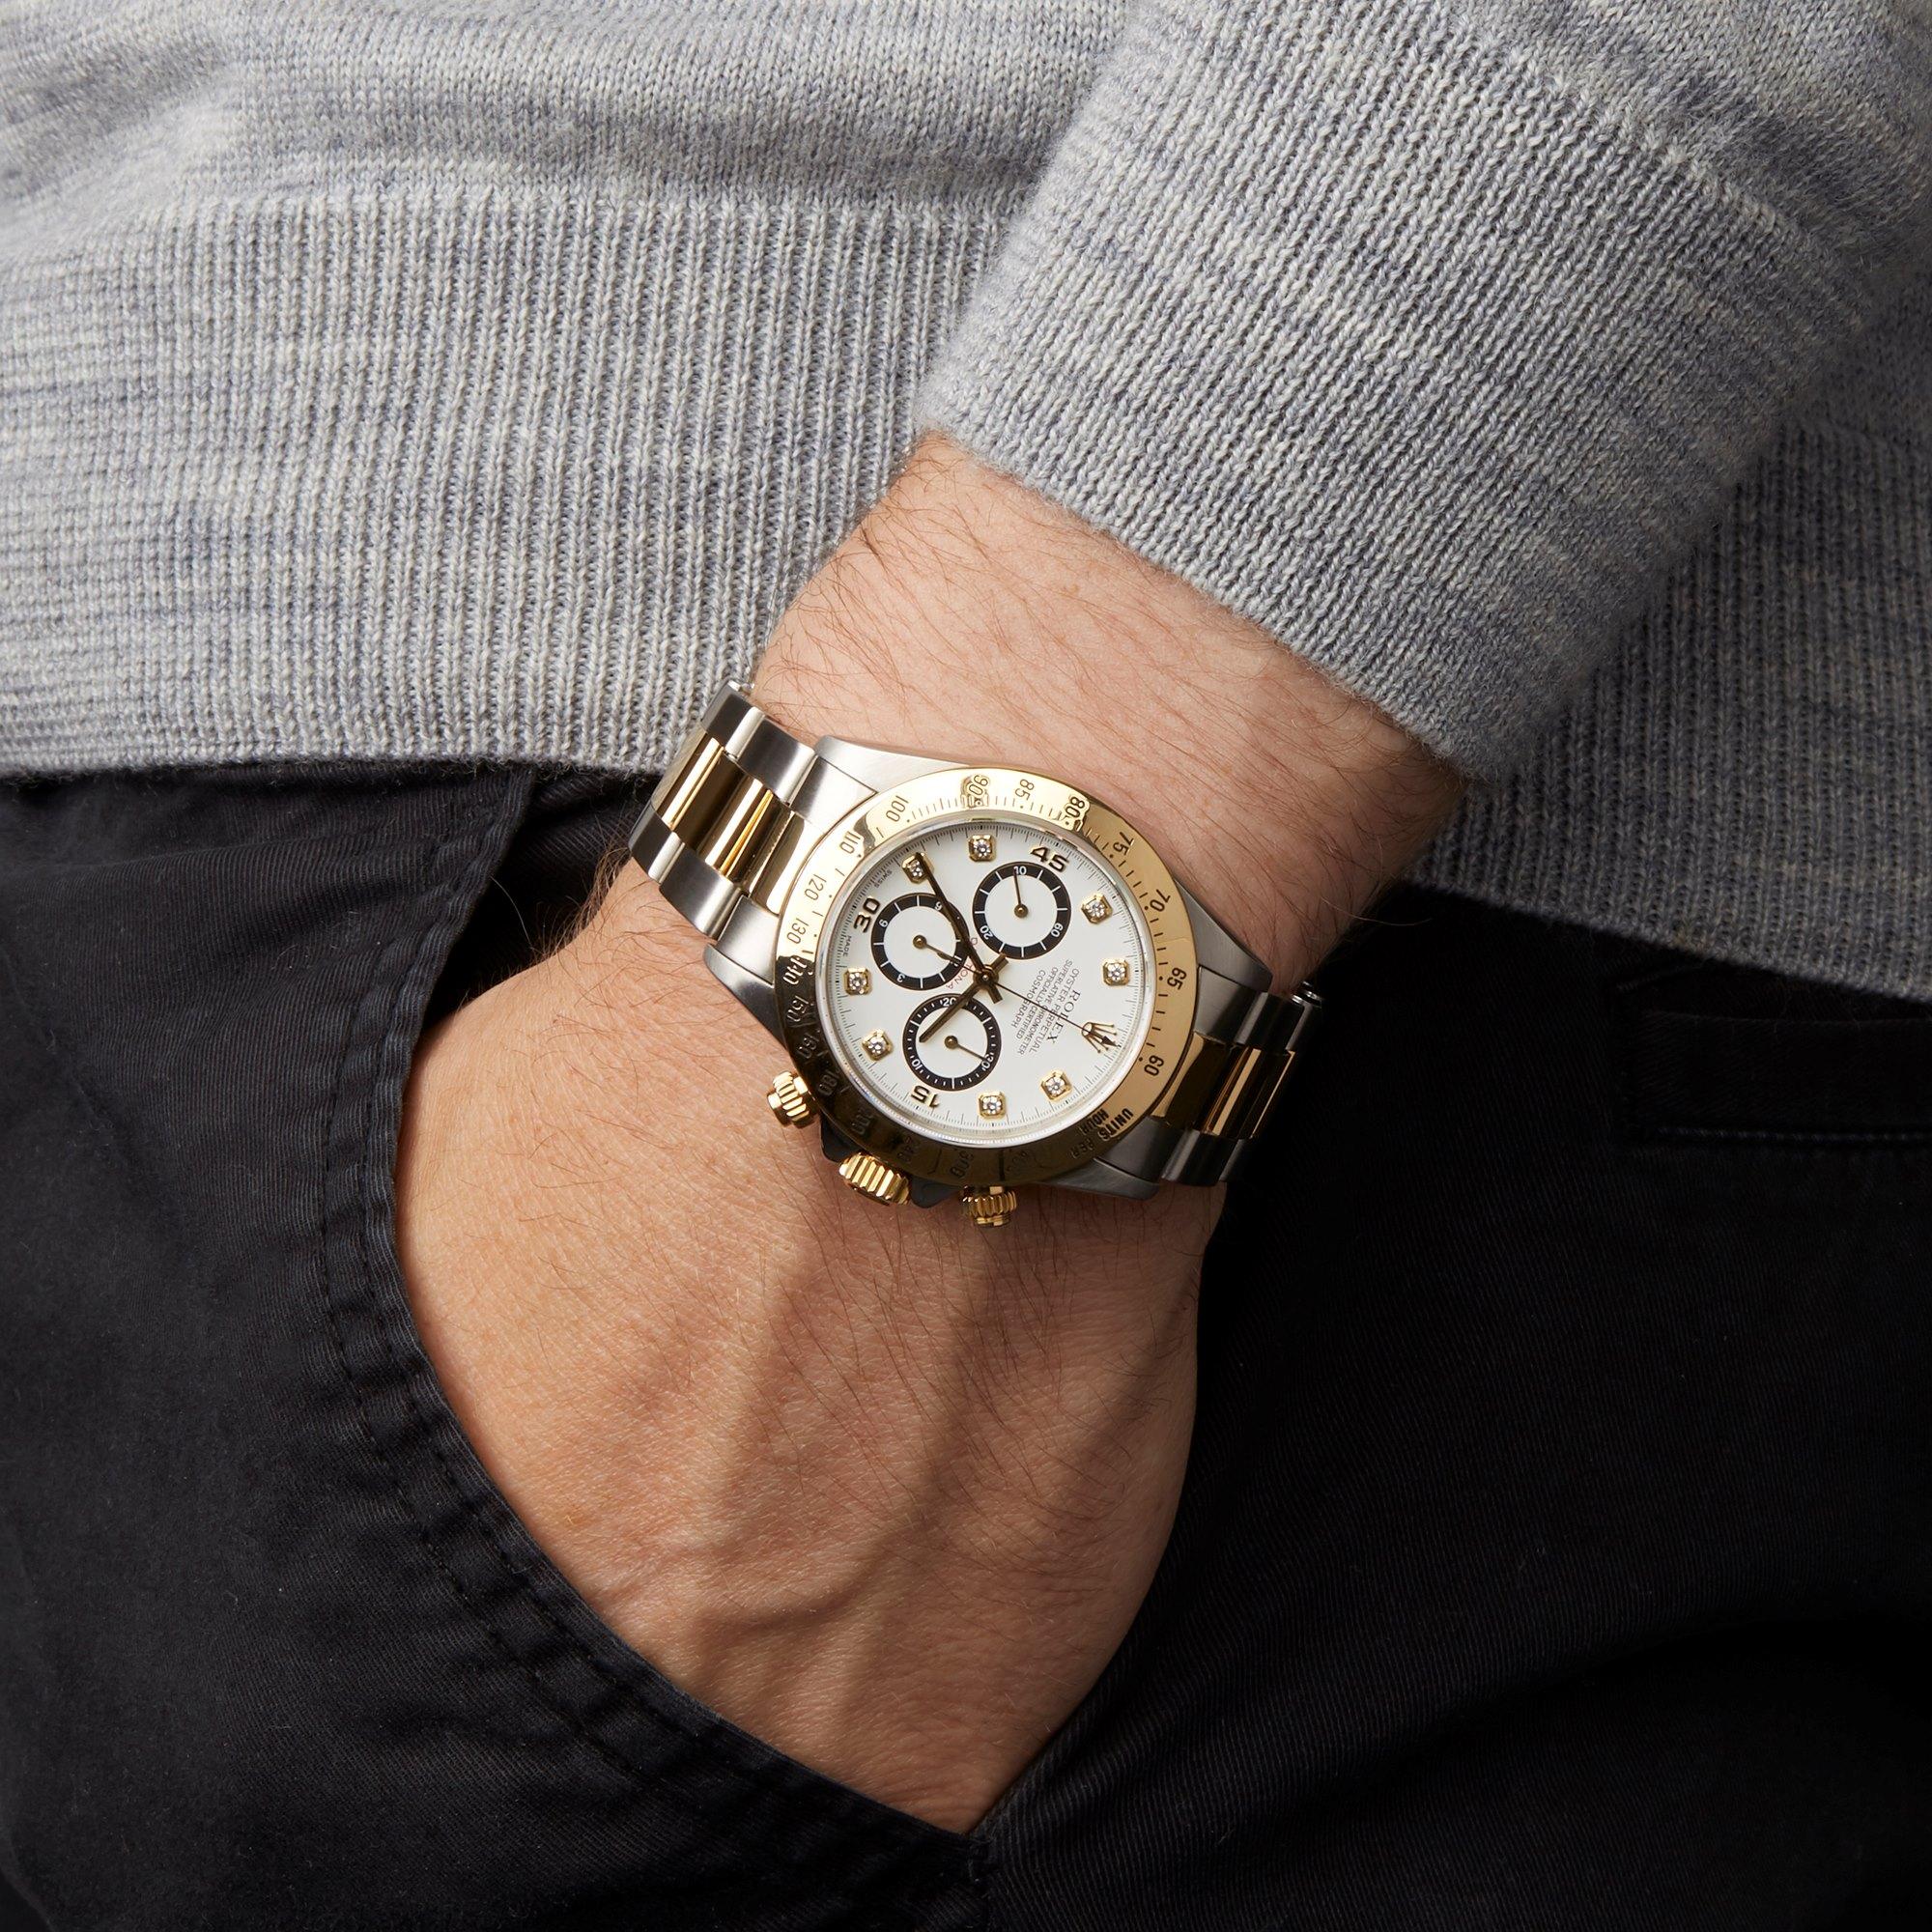 Rolex Daytona Diamond Inverted 6 Zenith Chronograph Stainless Steel & Yellow Gold 16523